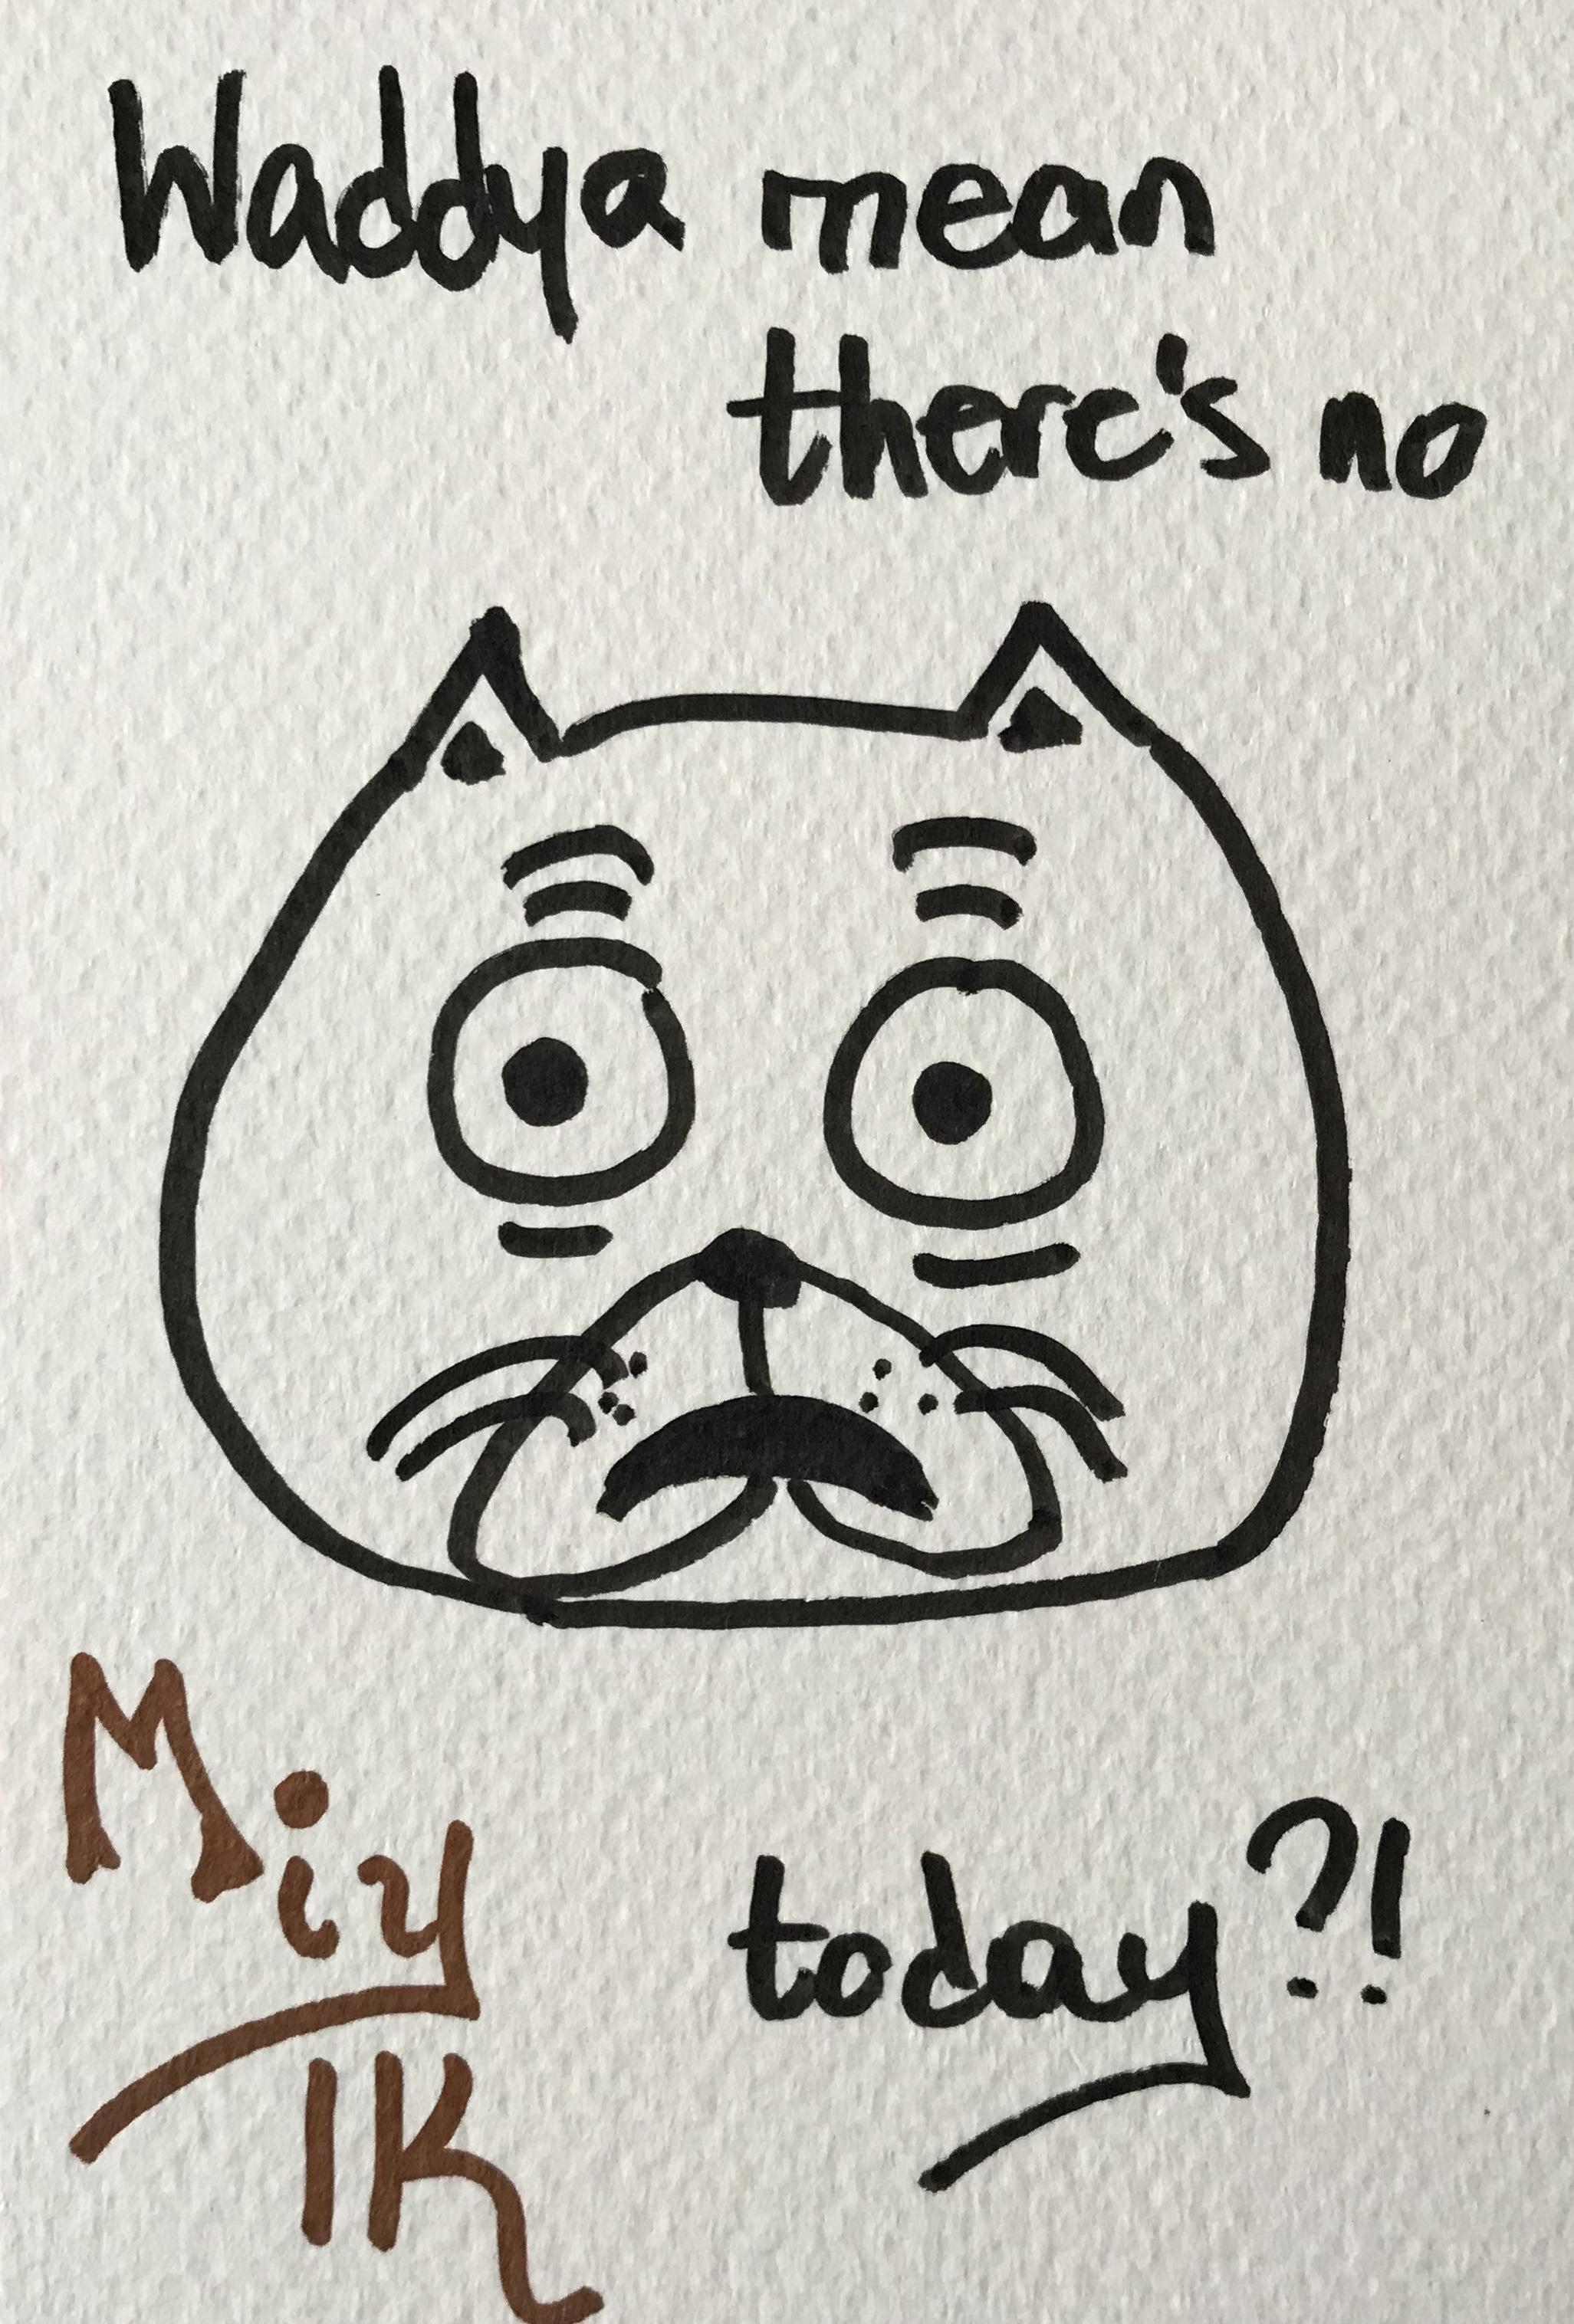 Waddya mean there's no miylk today kitten art postcard marker calligraphy typography kawaii かわいい 描く